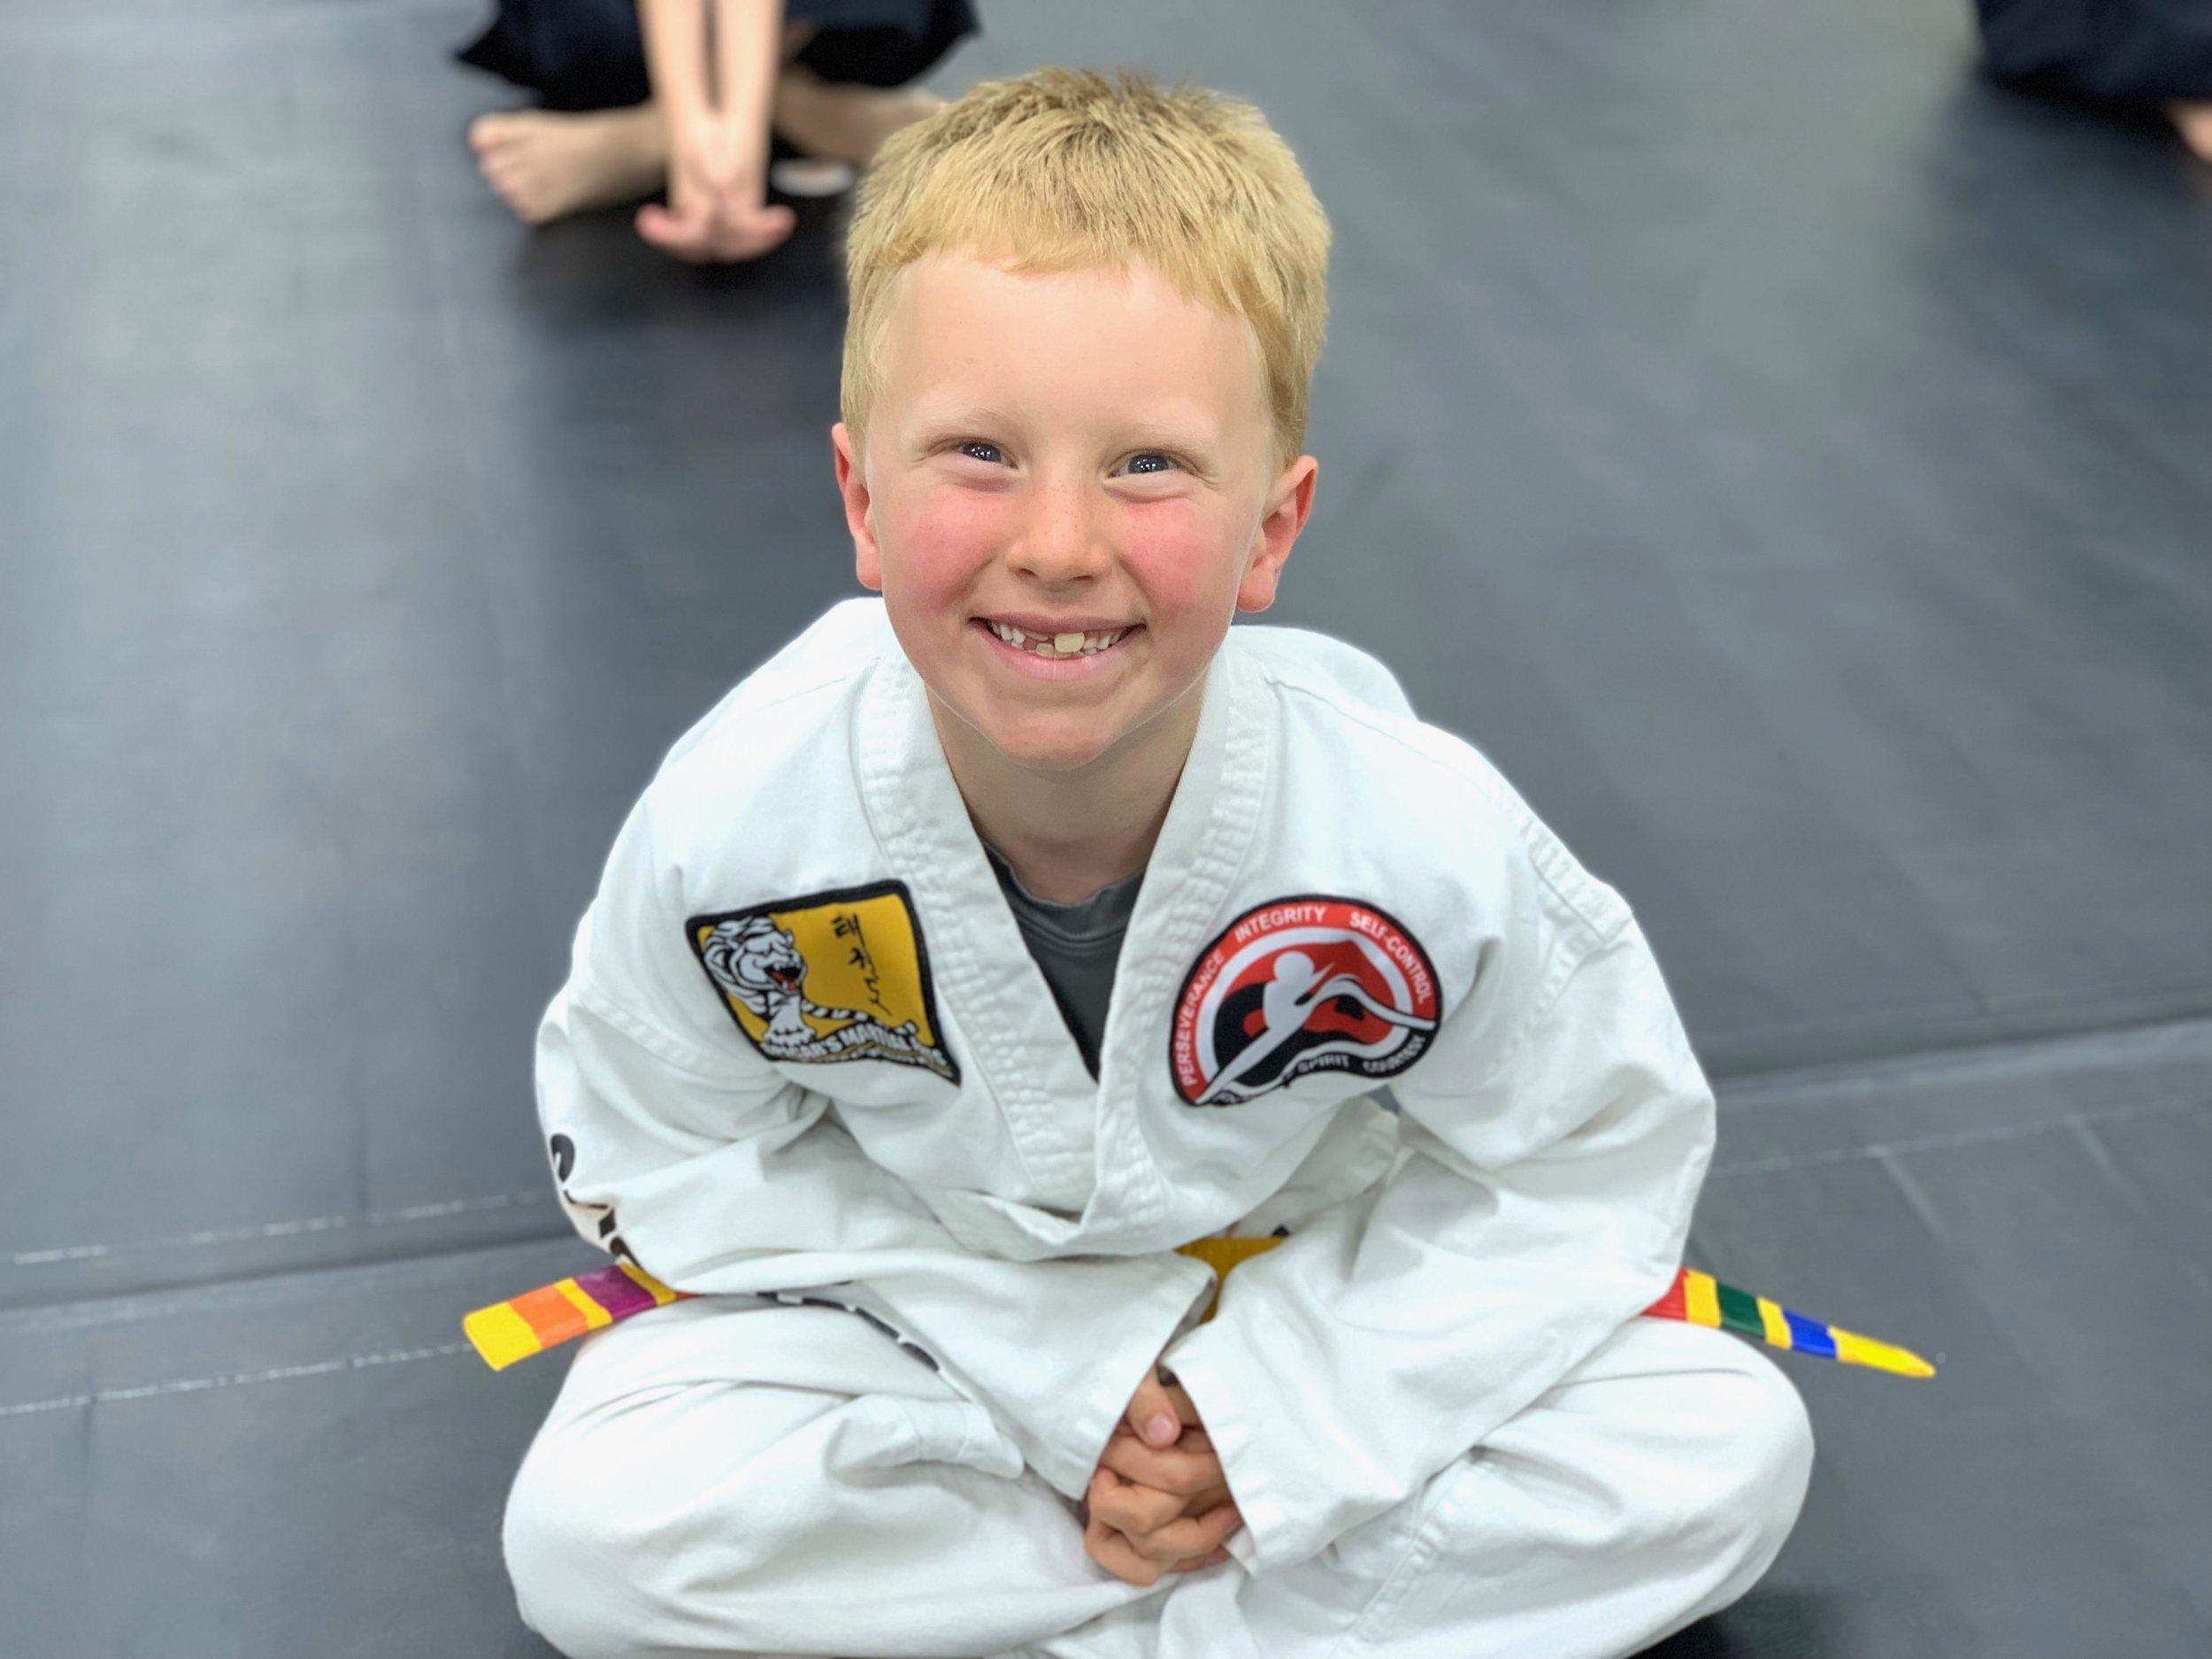 karate-kids-program-souhtlake-keller-grapevine-texas00049.jpeg